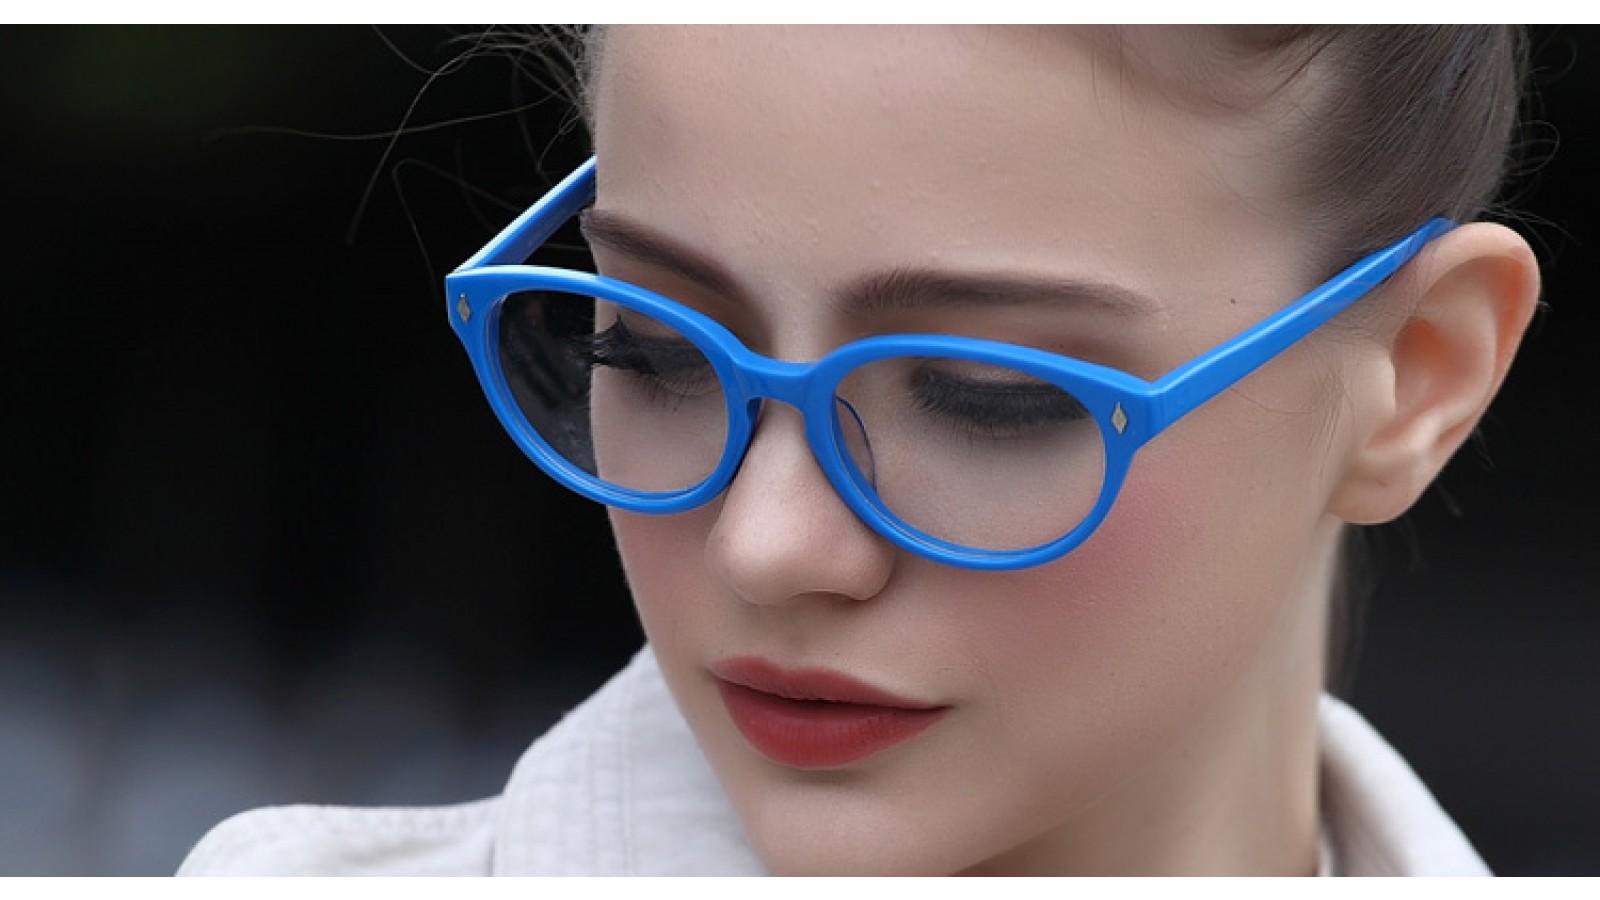 Blaue Vollrandbrille im Nerdlook